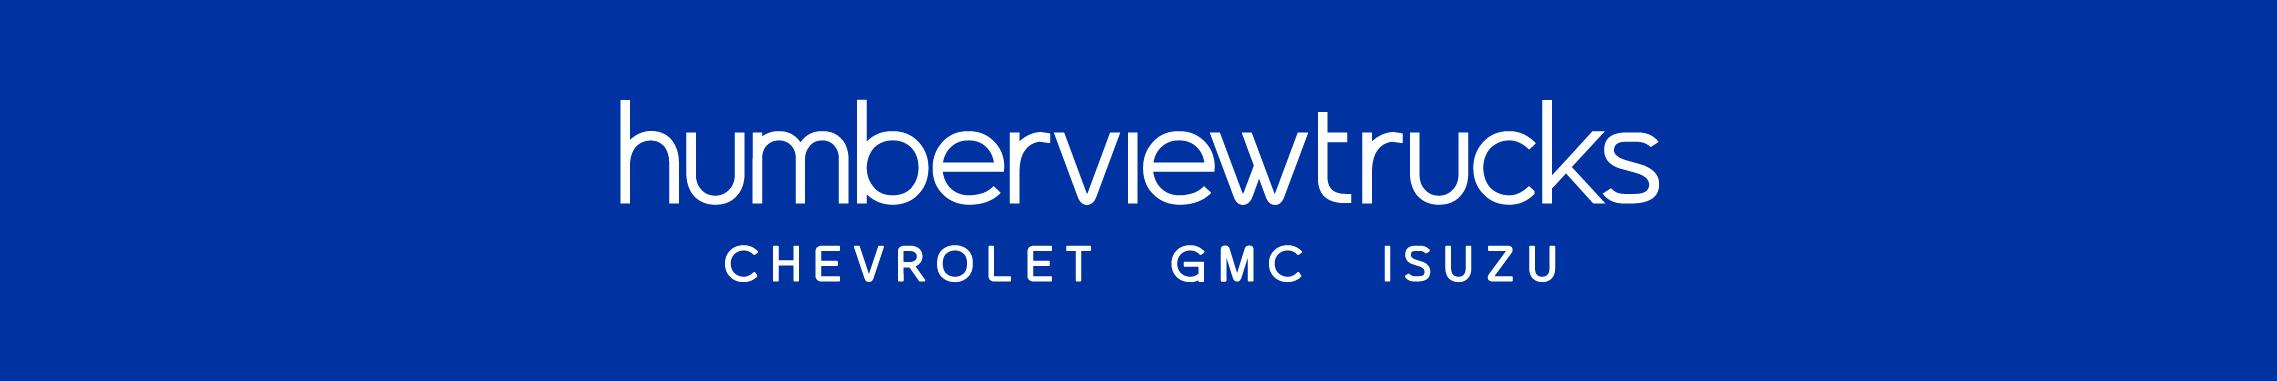 Humberview Trucks Banner